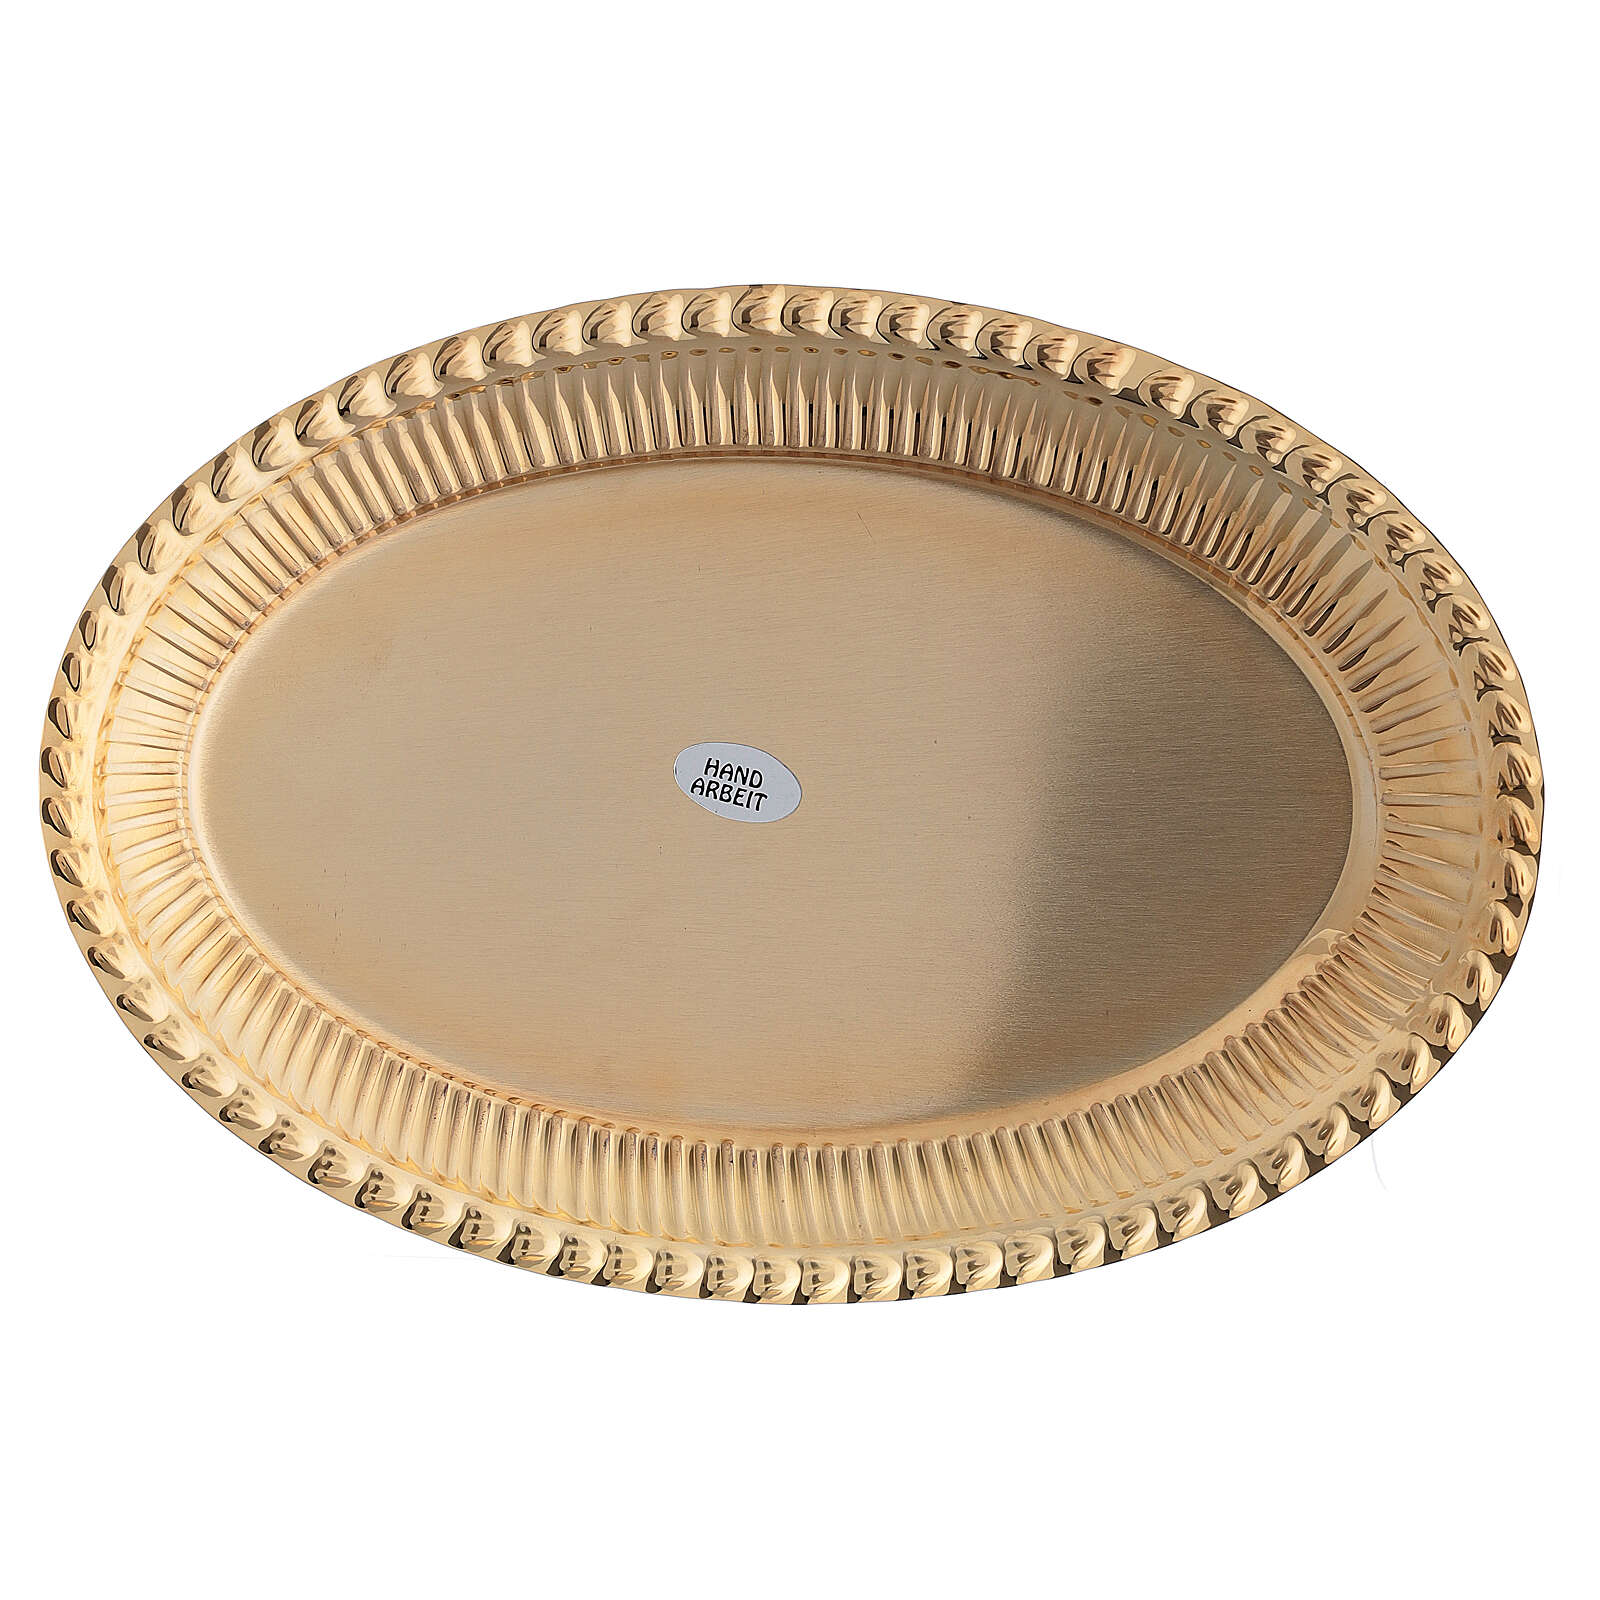 Bandeja latón dorado ovalado recambio set celebración 24x16 cm 4